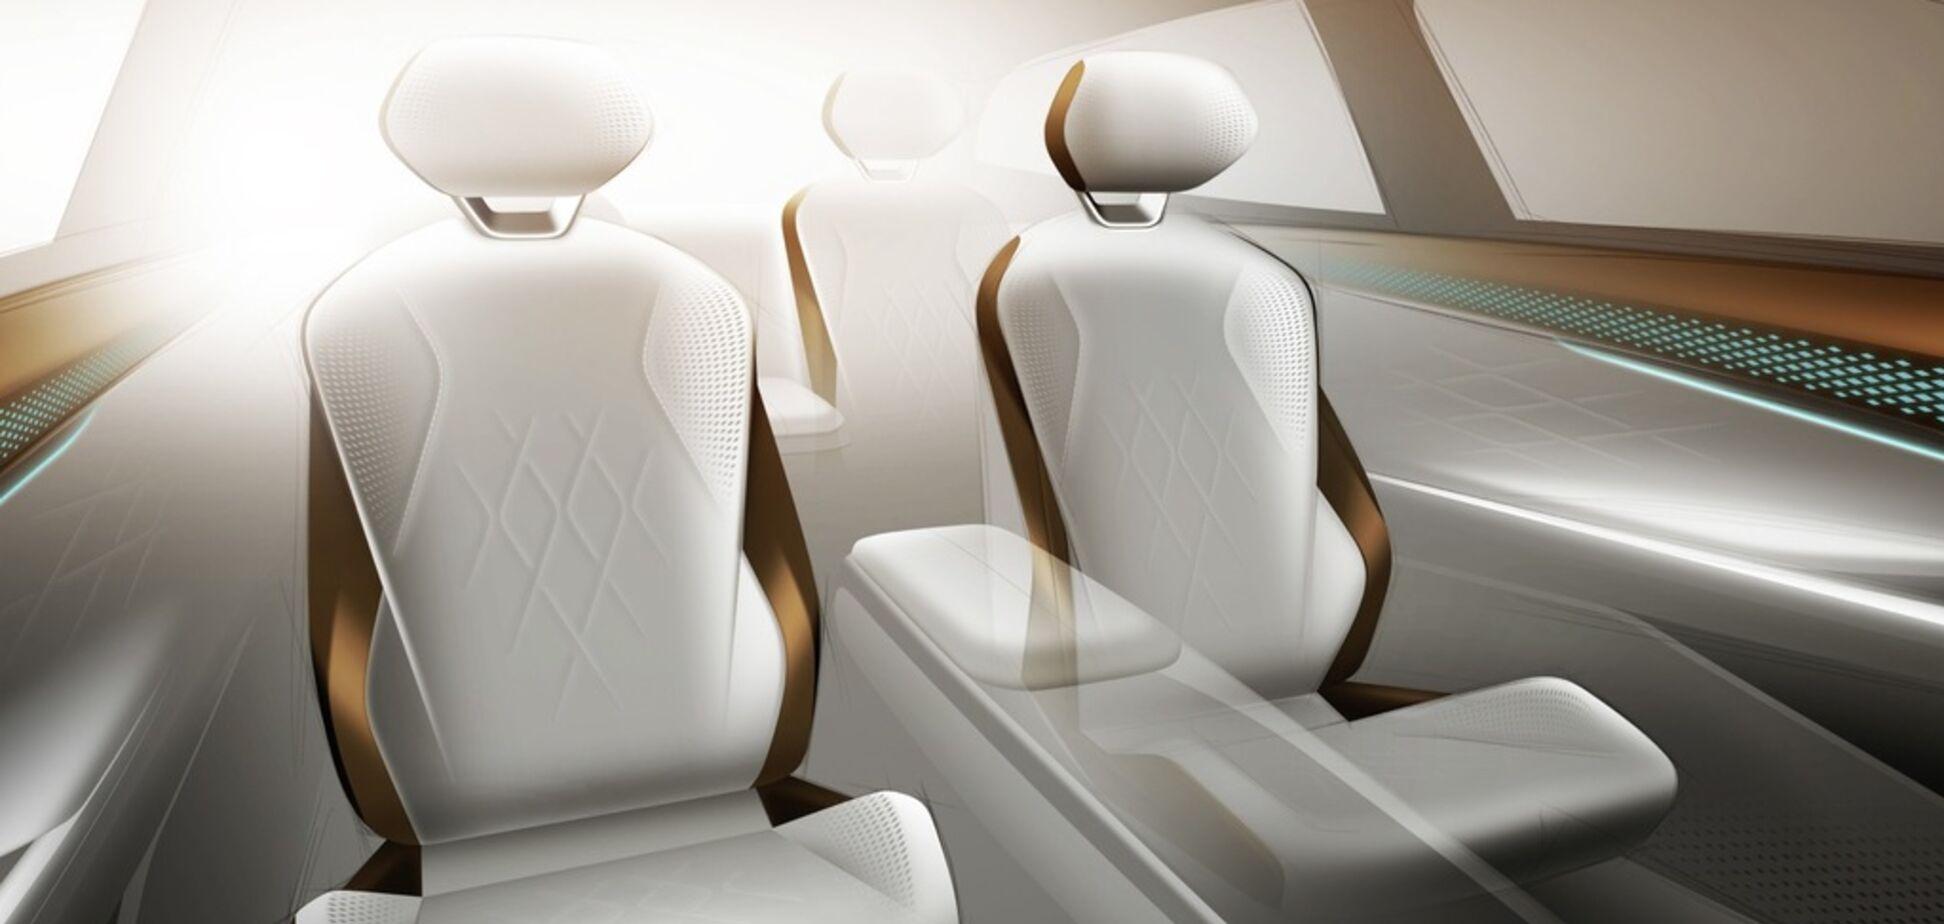 Кросовер майбутнього: Volkswagen показала концепт електрокара ID Space Vizzion